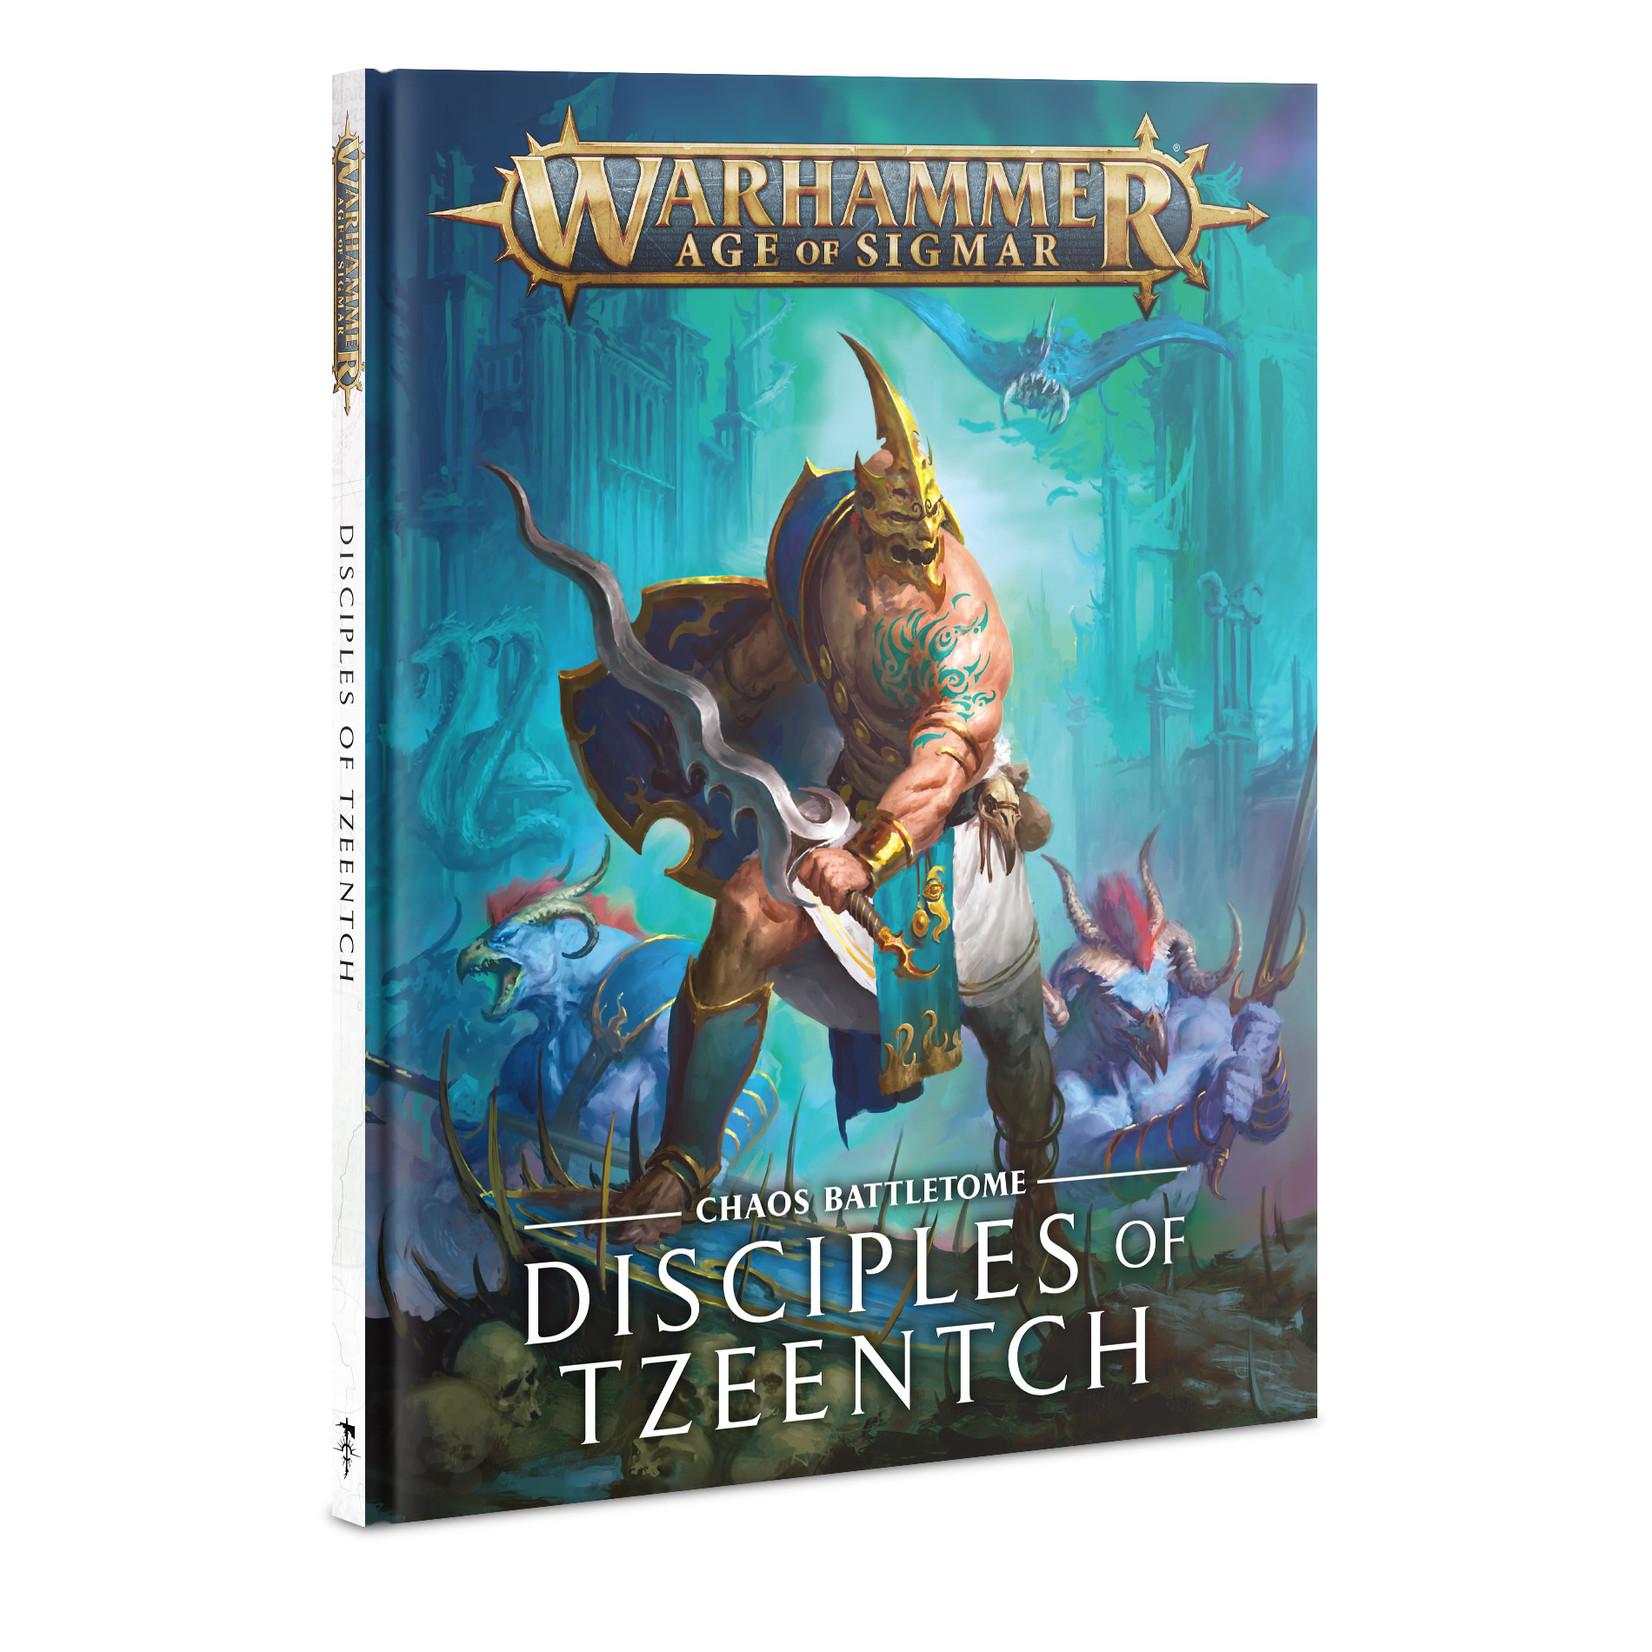 Games Workshop Battletome Disciples of Tzeentch